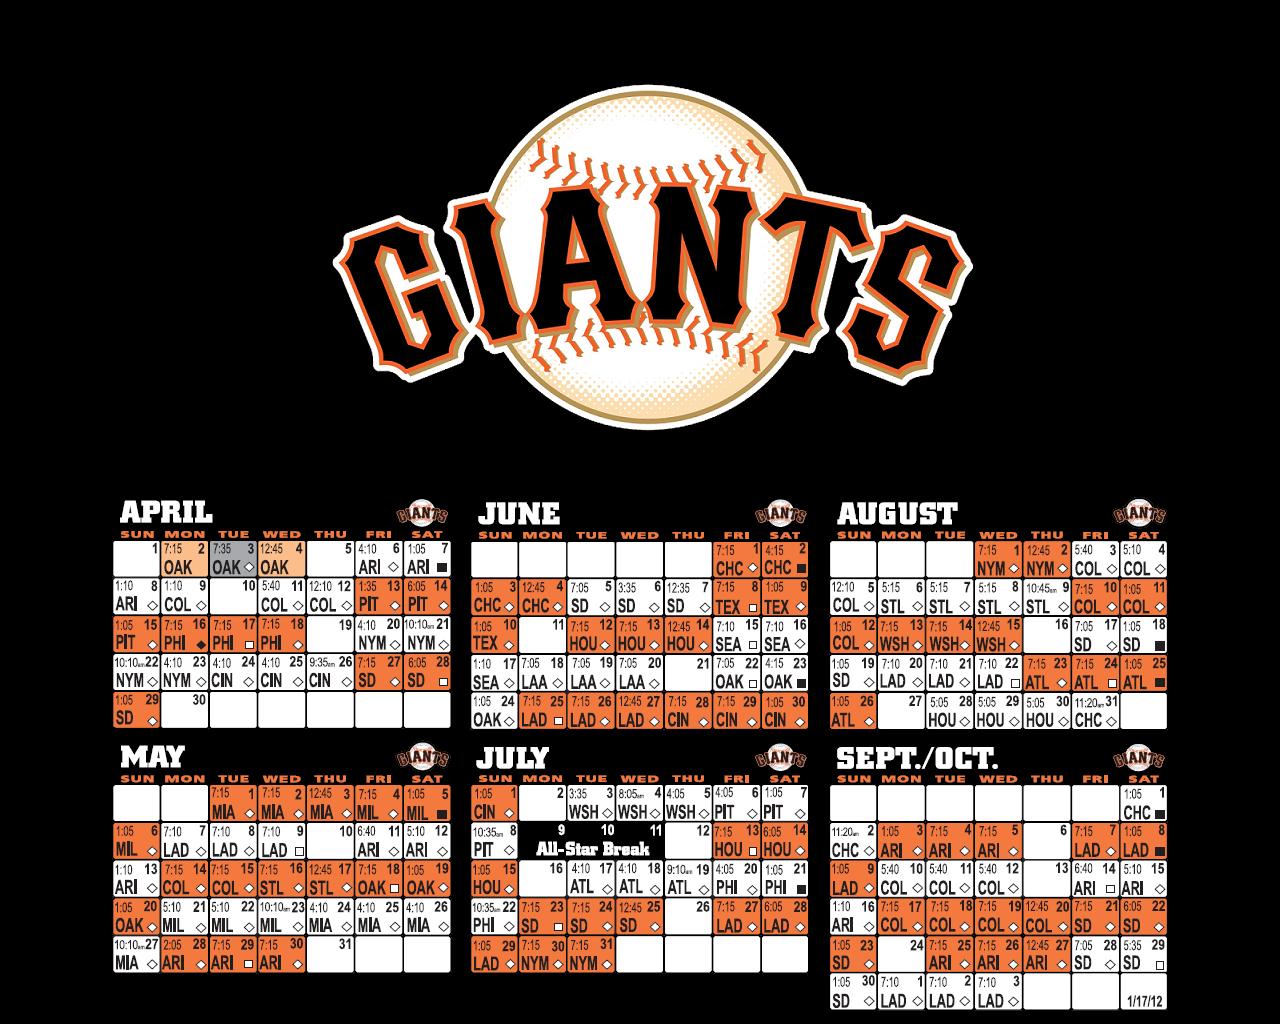 sf giants 2015 schedule wallpaper - wallpapersafari